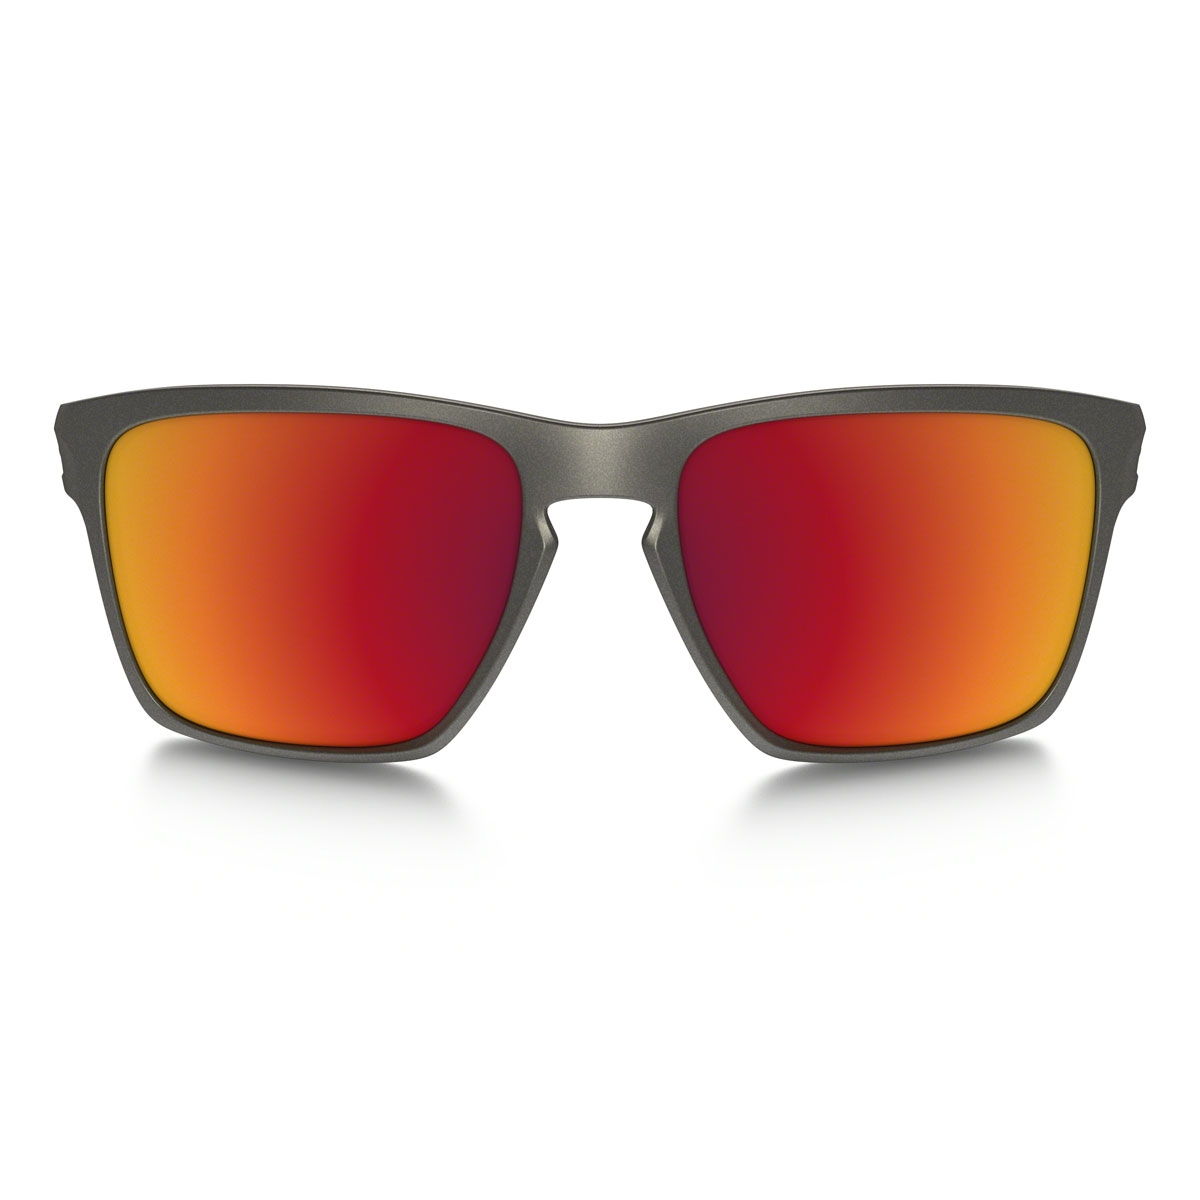 daf82ea61480c ... Image of Oakley Sliver XL Sunglasses - Lead Frame   Torch Iridium Lens